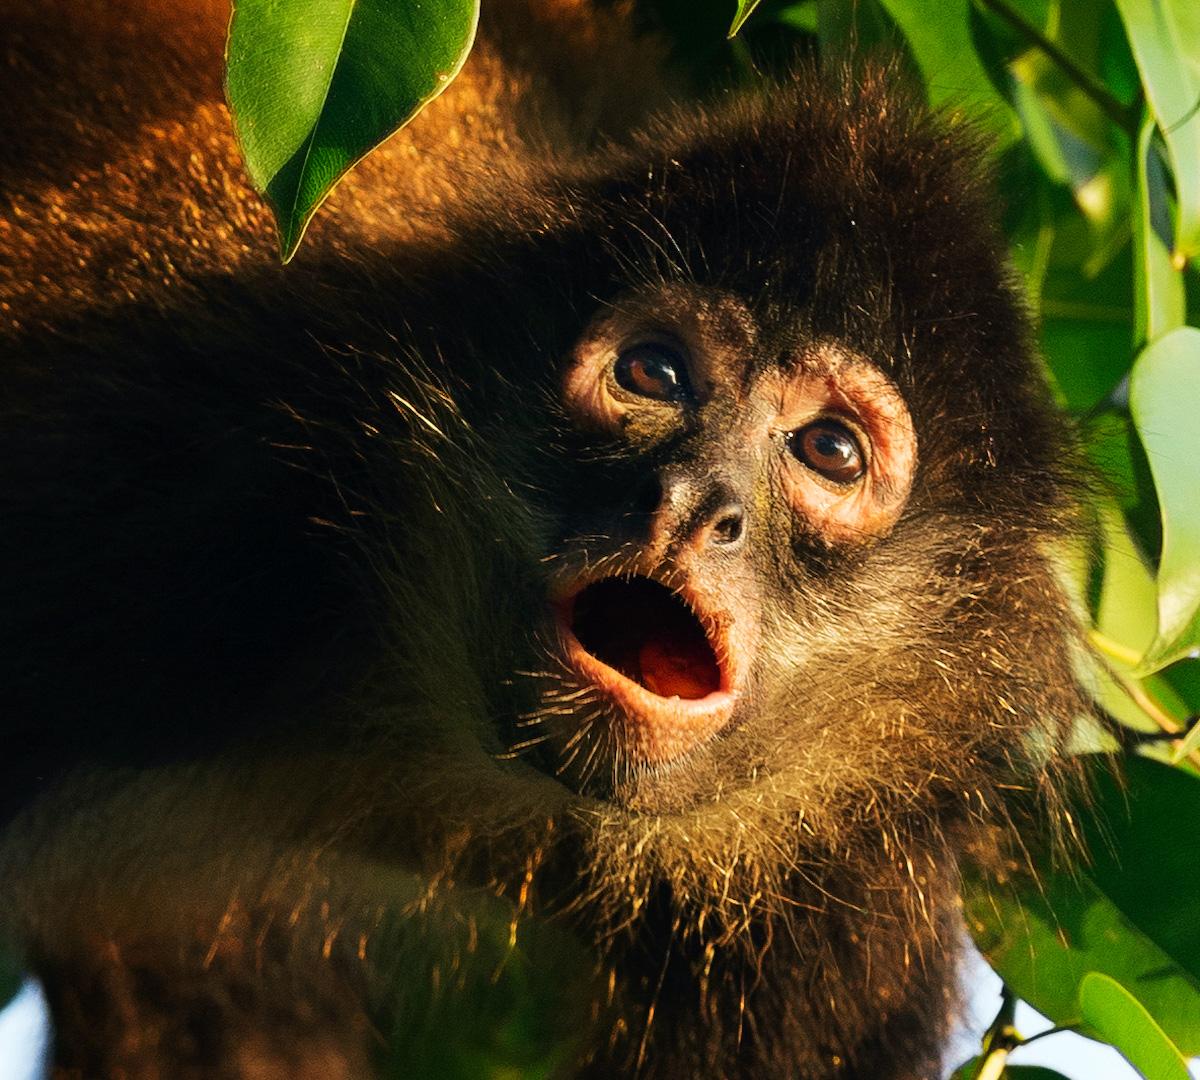 Costa Ricas Regnskogar